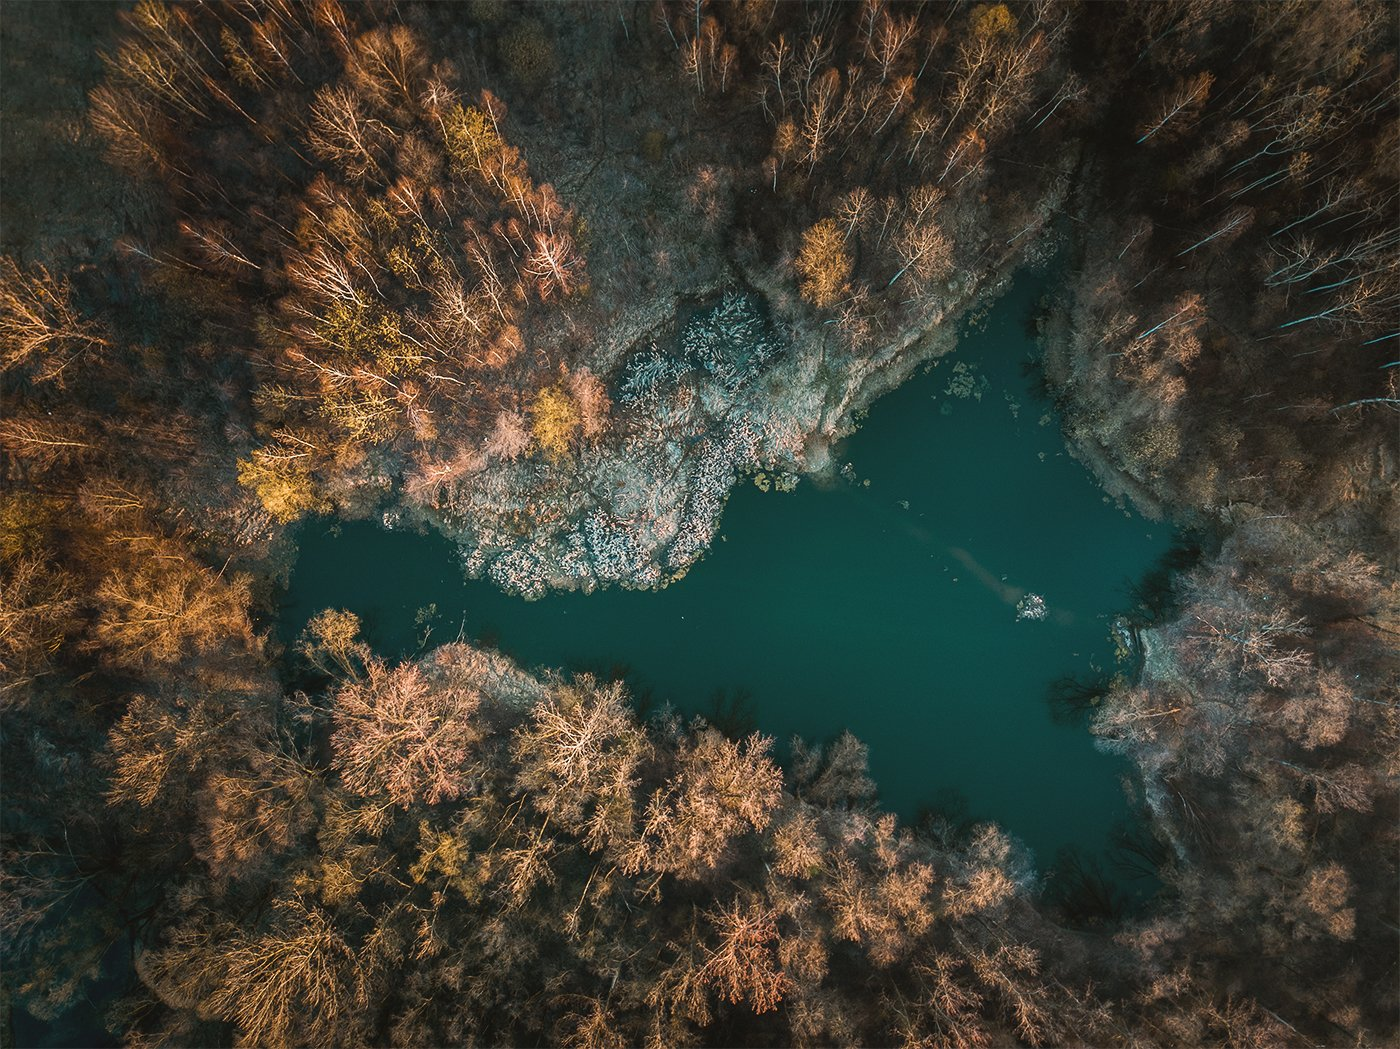 landscape,, dji mavic pro, trees, pond, lake, Fichna Adam